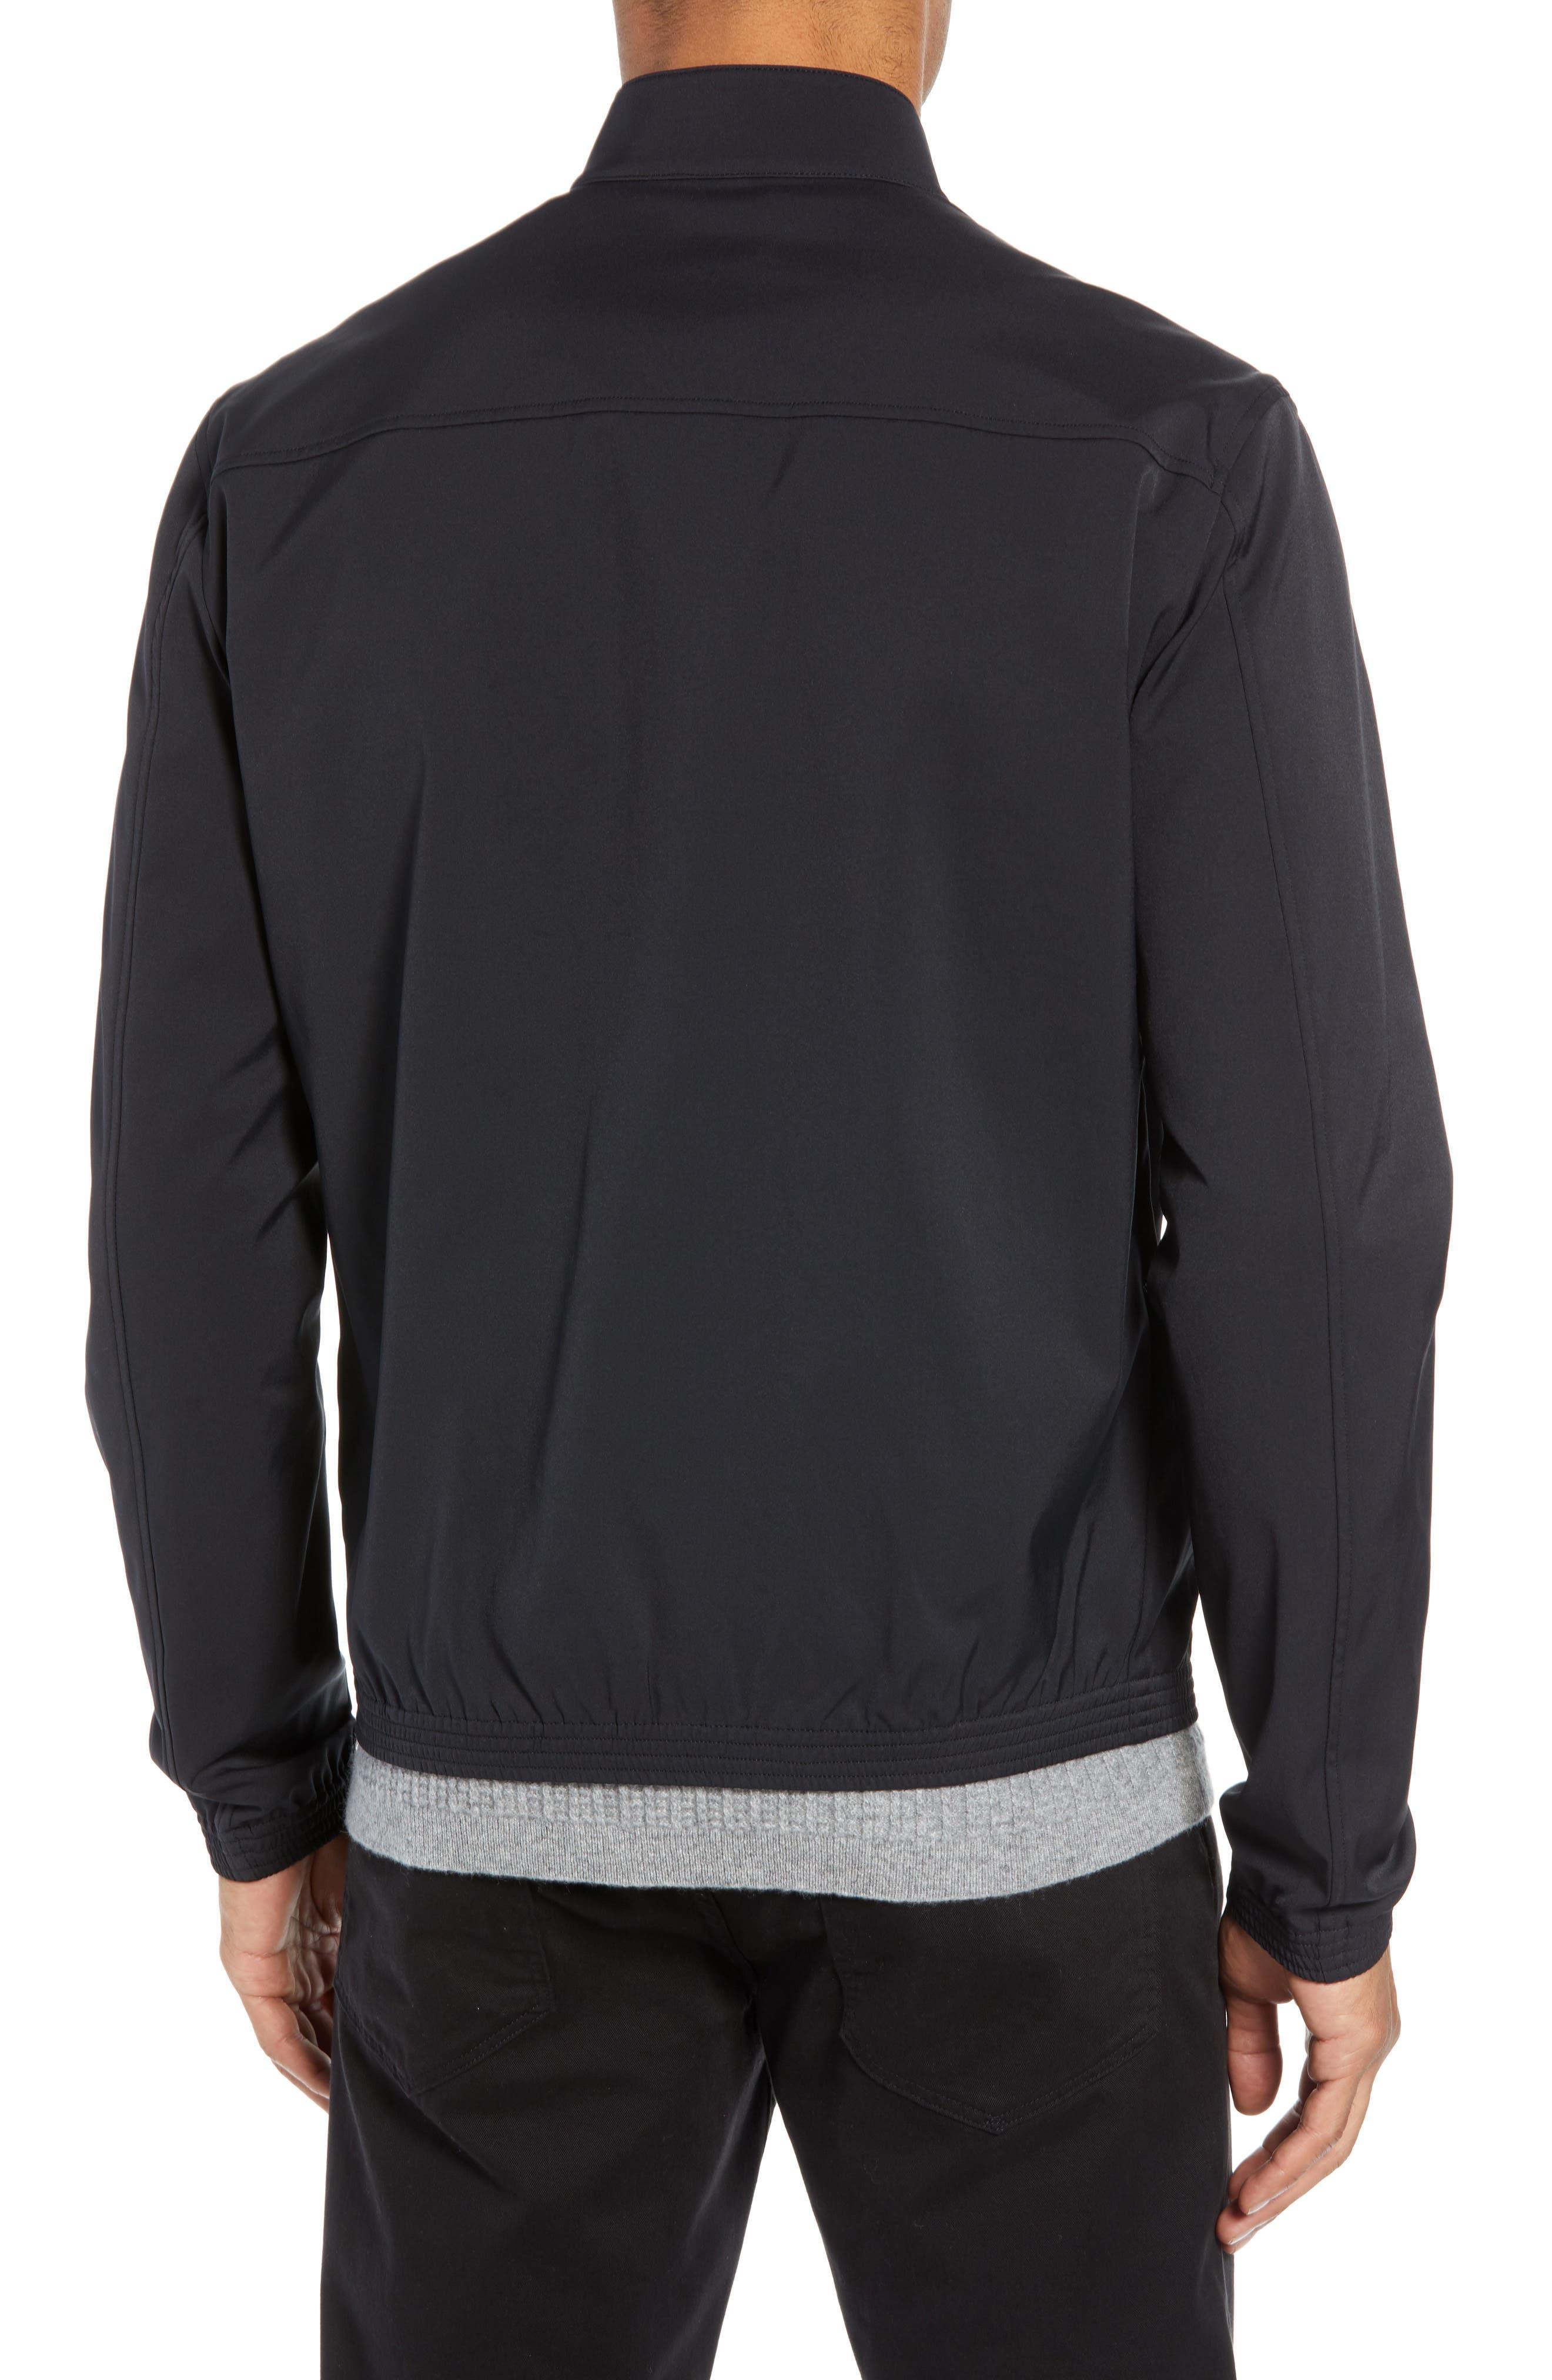 Tremont Neoteric Regular Fit Jacket,                             Alternate thumbnail 2, color,                             BLACK